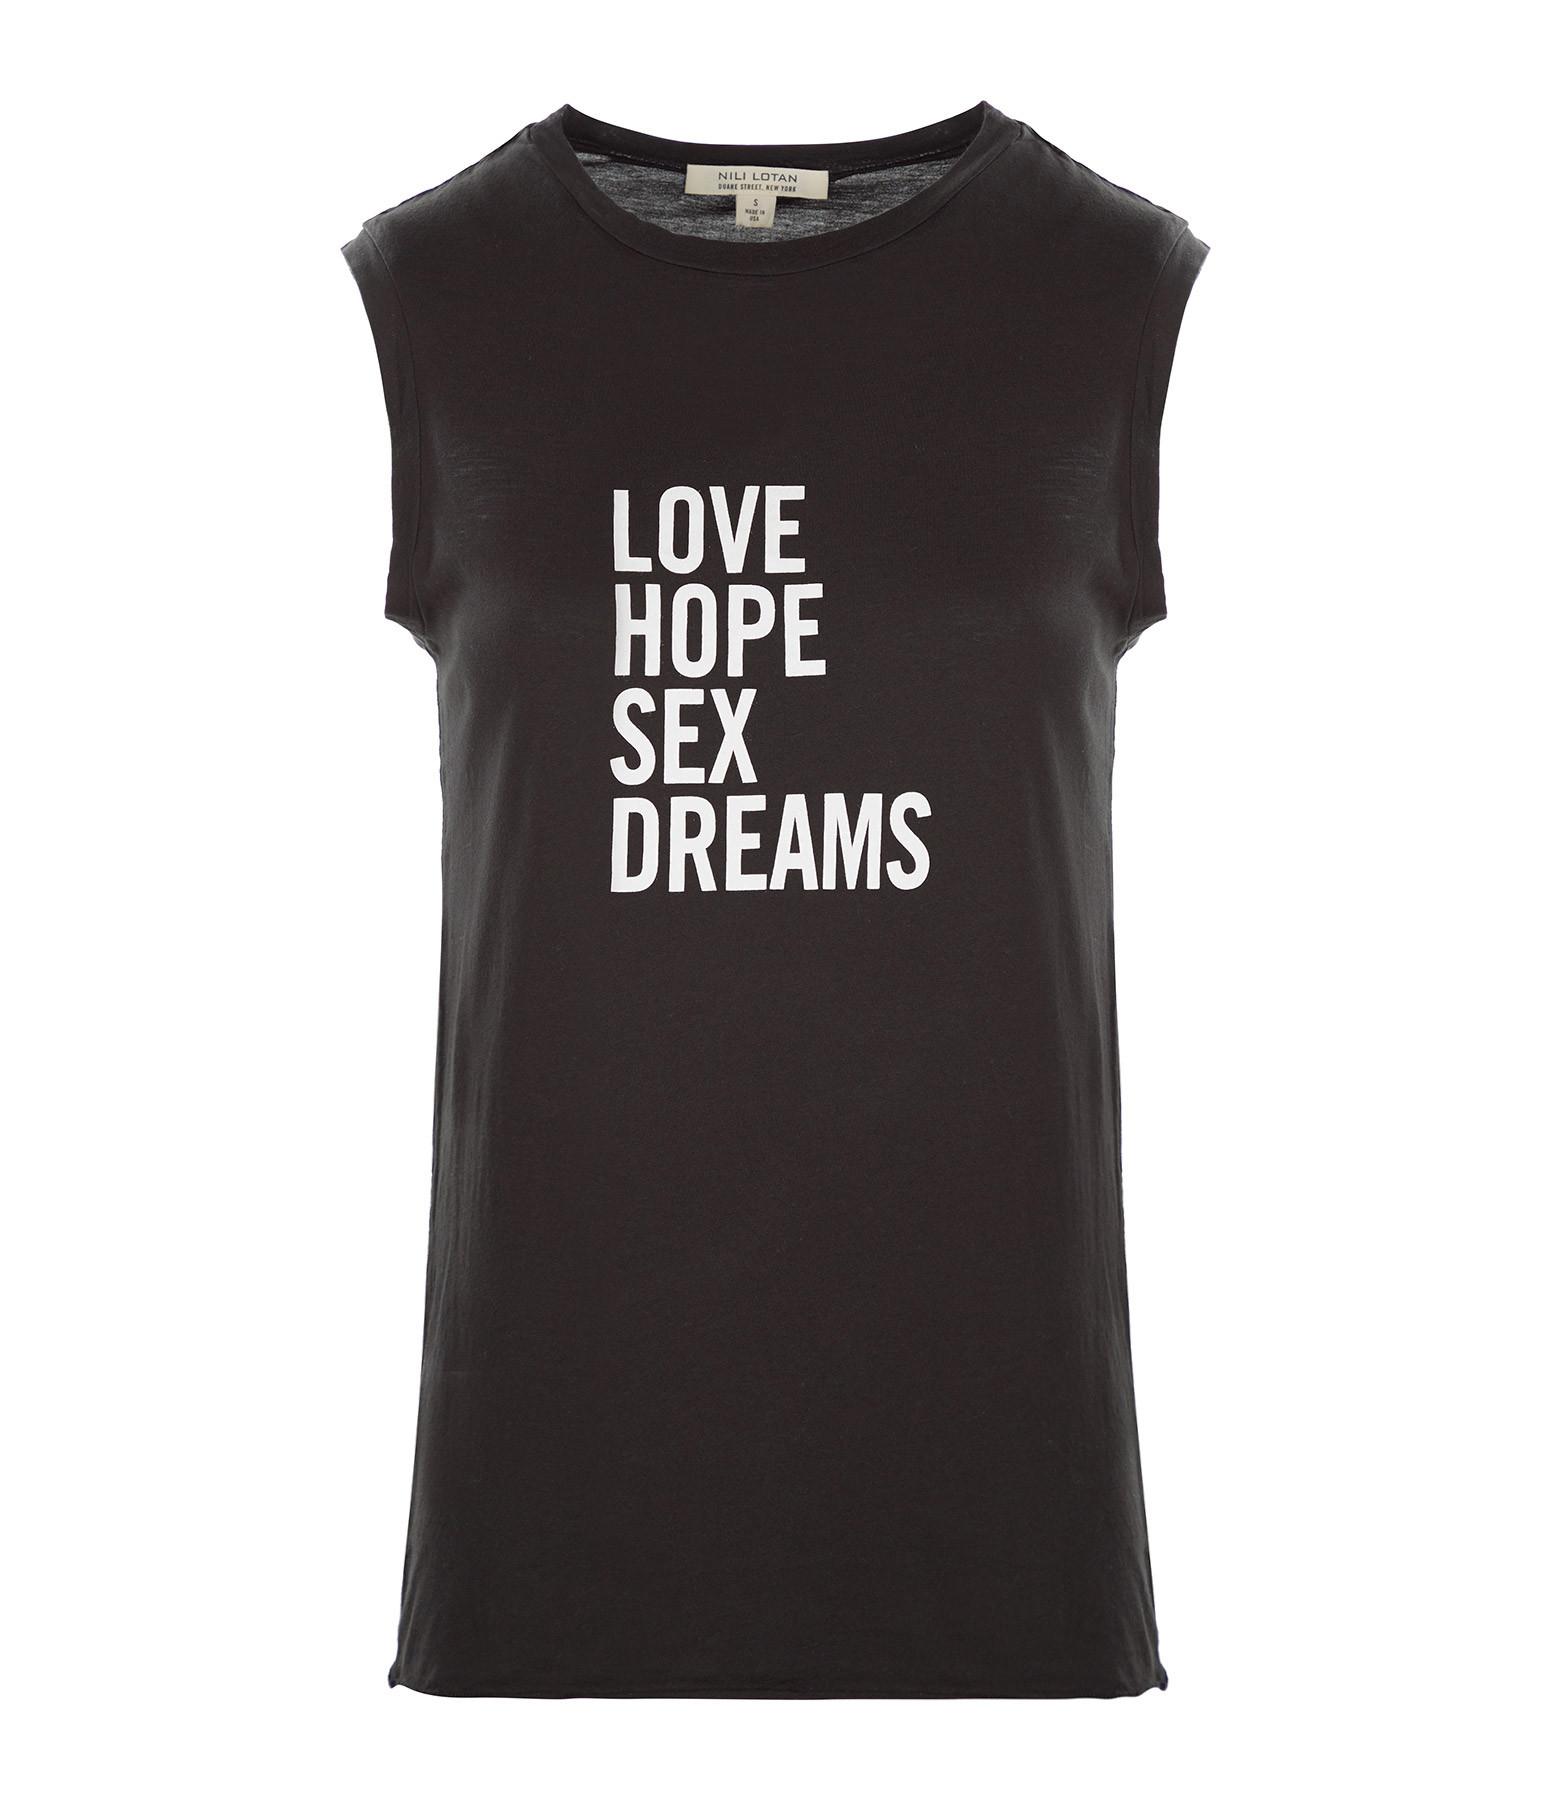 NILI LOTAN - Tee-shirt Love Hope Sex Coton Noir